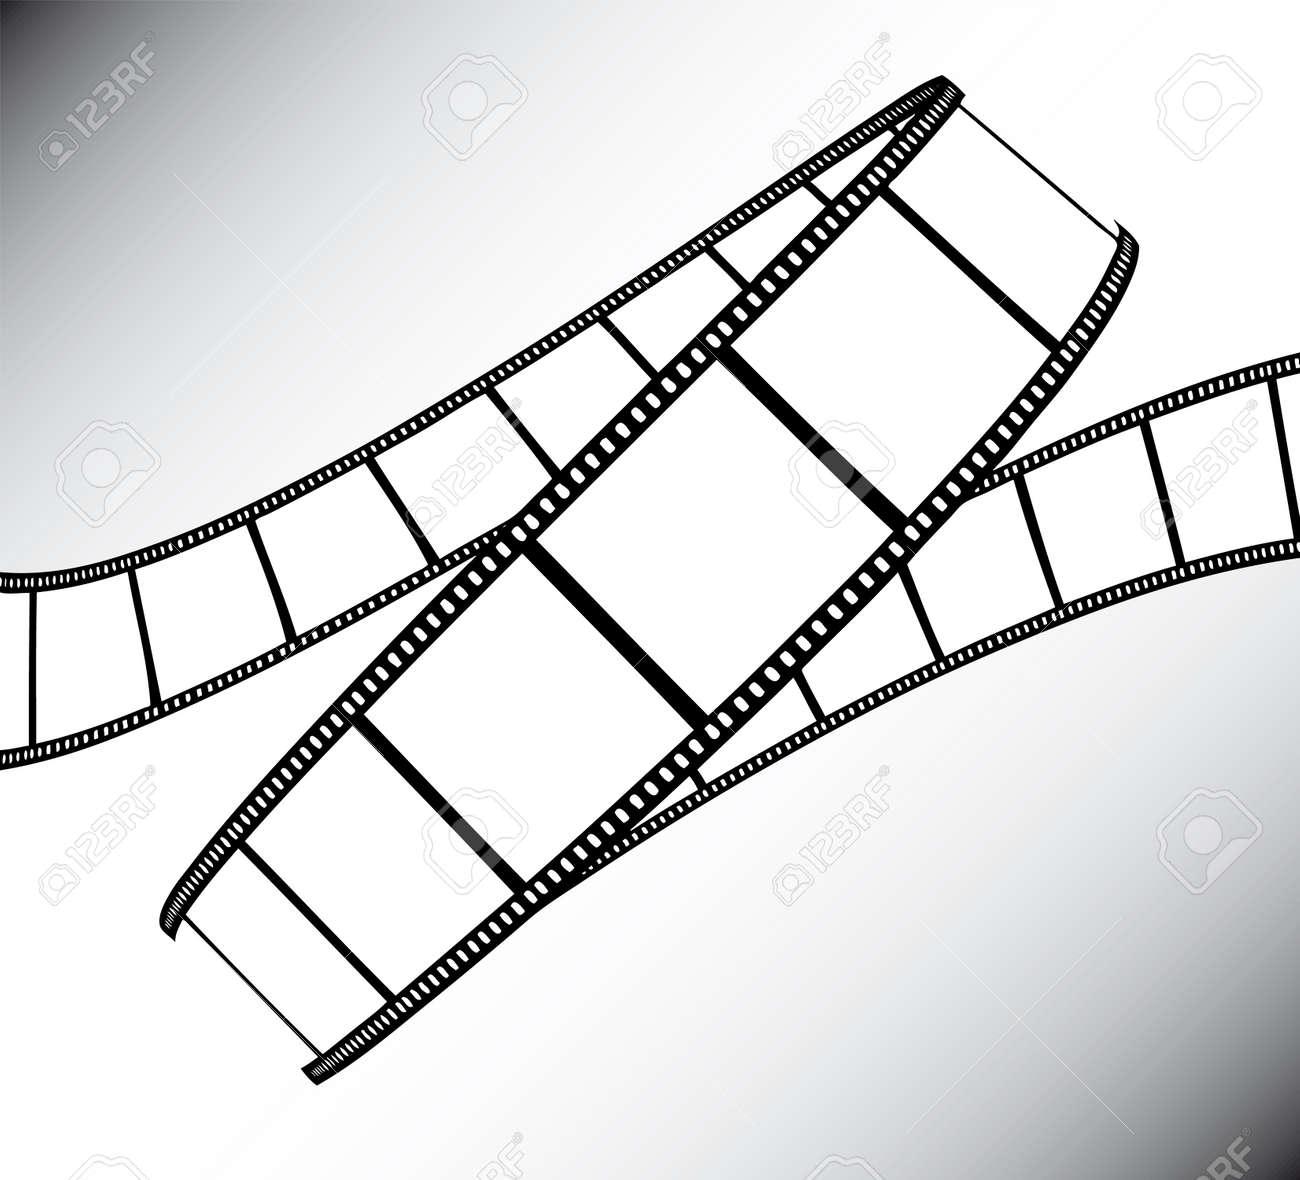 movie/photo film - illustration on gradient background Stock Vector - 5200856